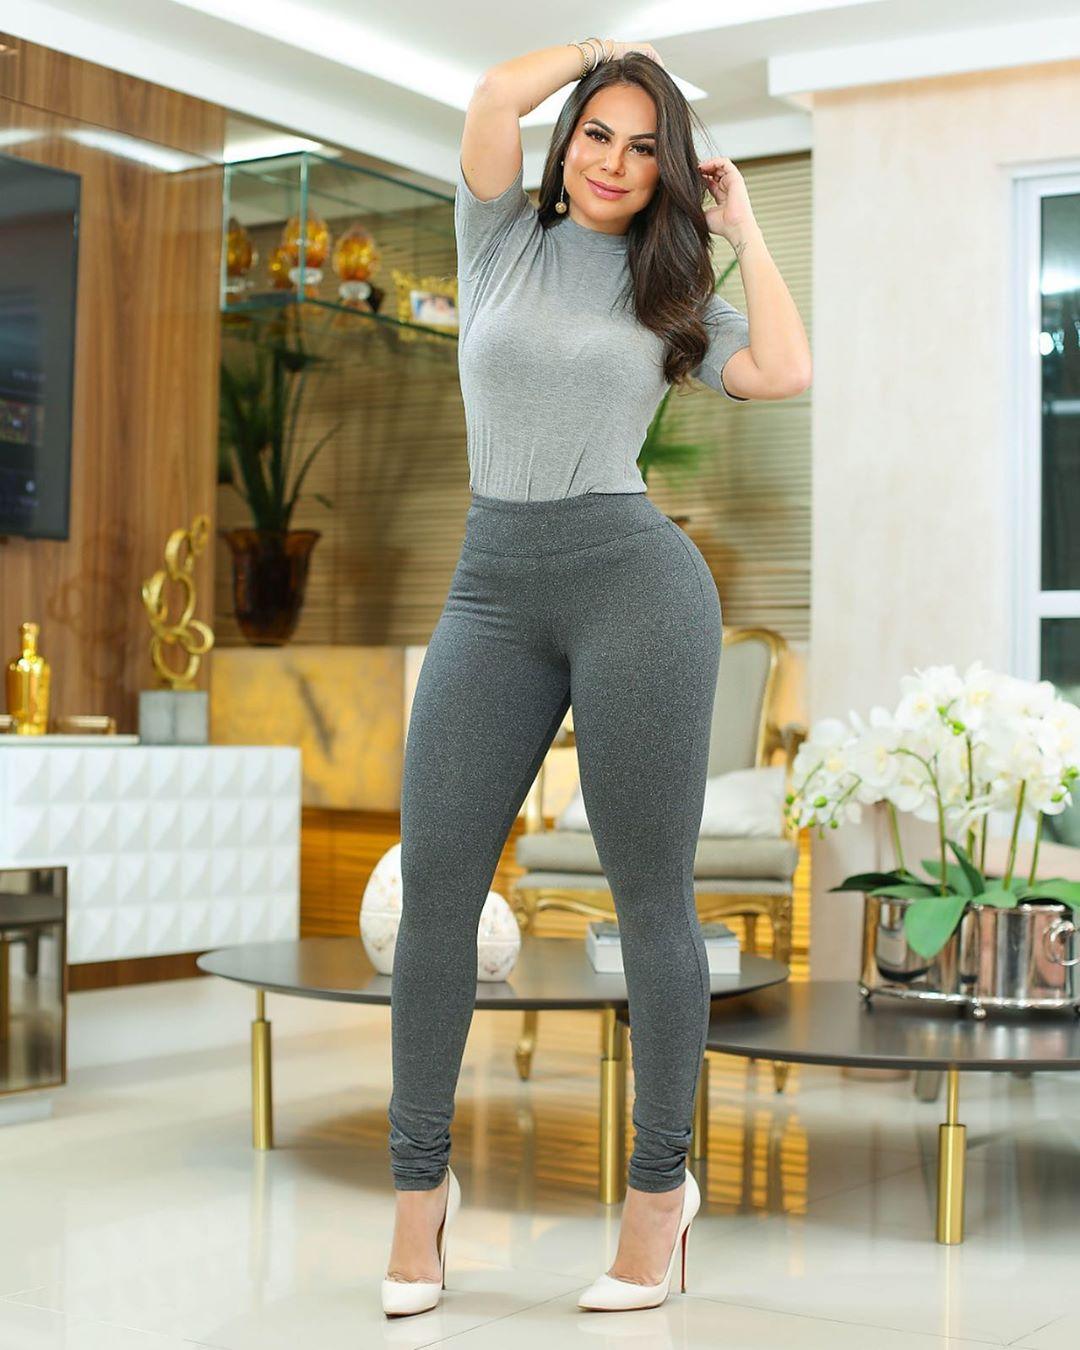 Calça Legging Modeladora Cinza - Empina Bumbum e Comprime a Barriga